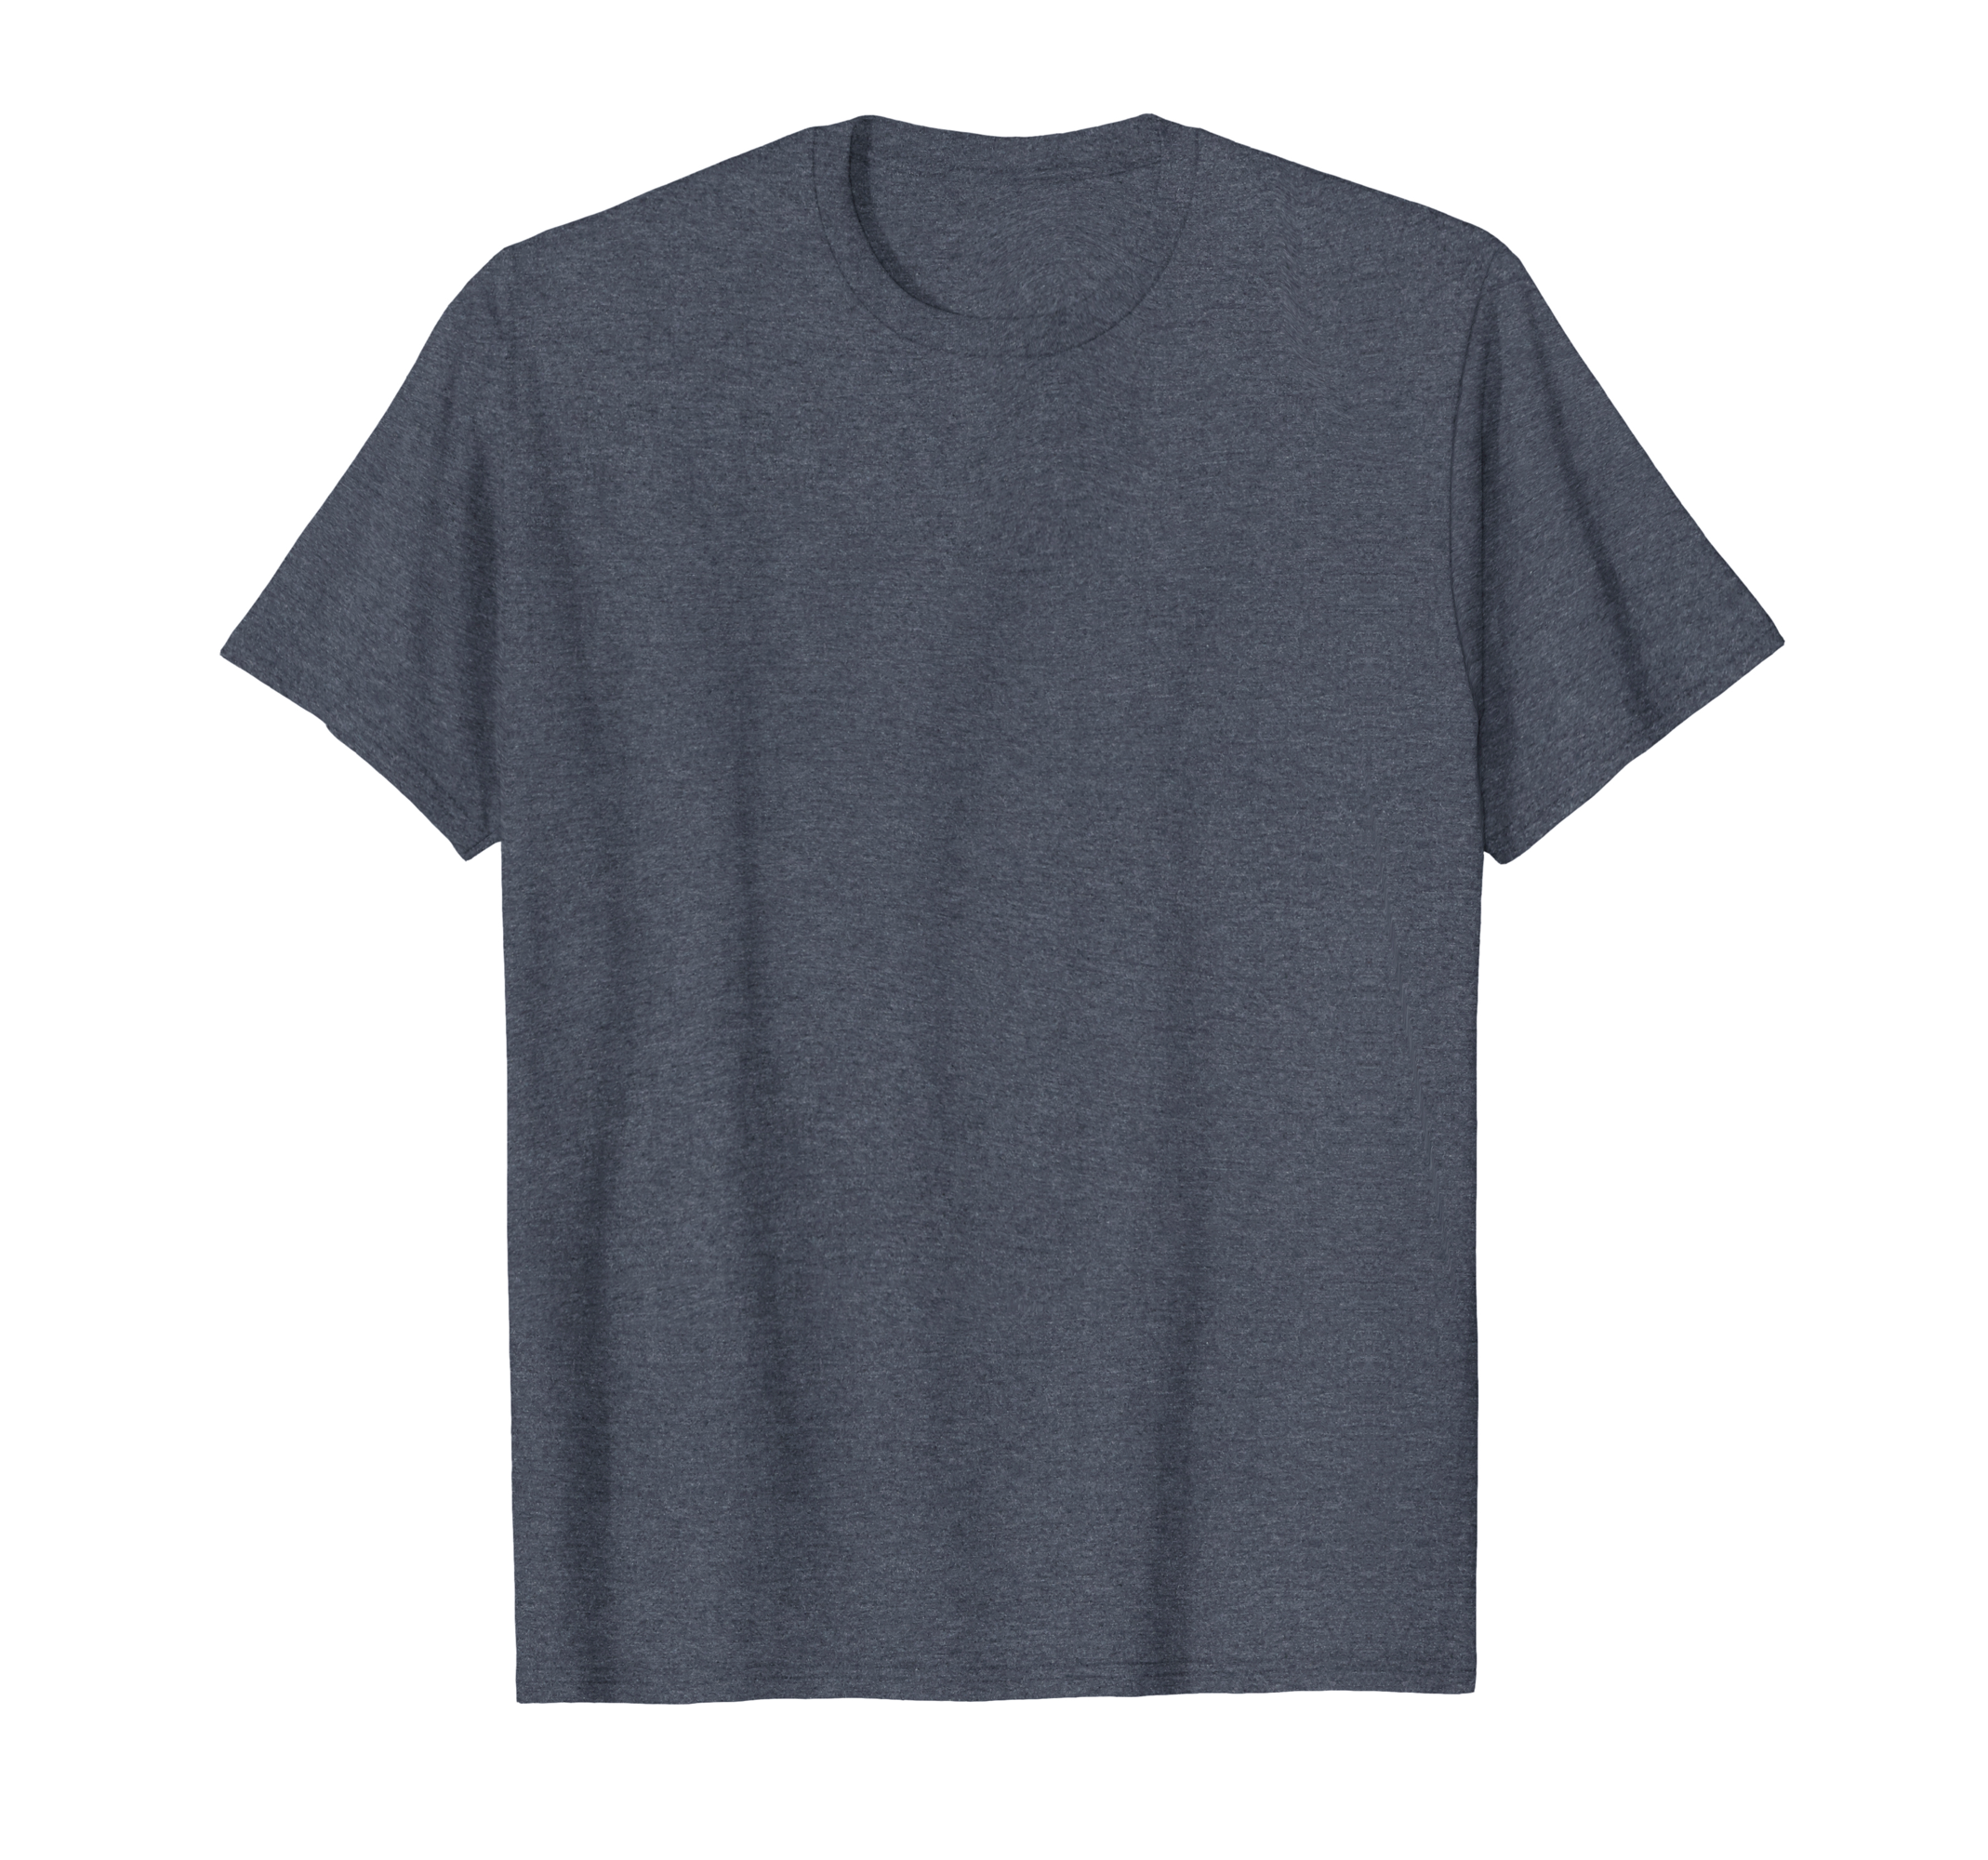 North Carolina Student University Football NC Short Sleeve T-Shirt Tees Tshirts